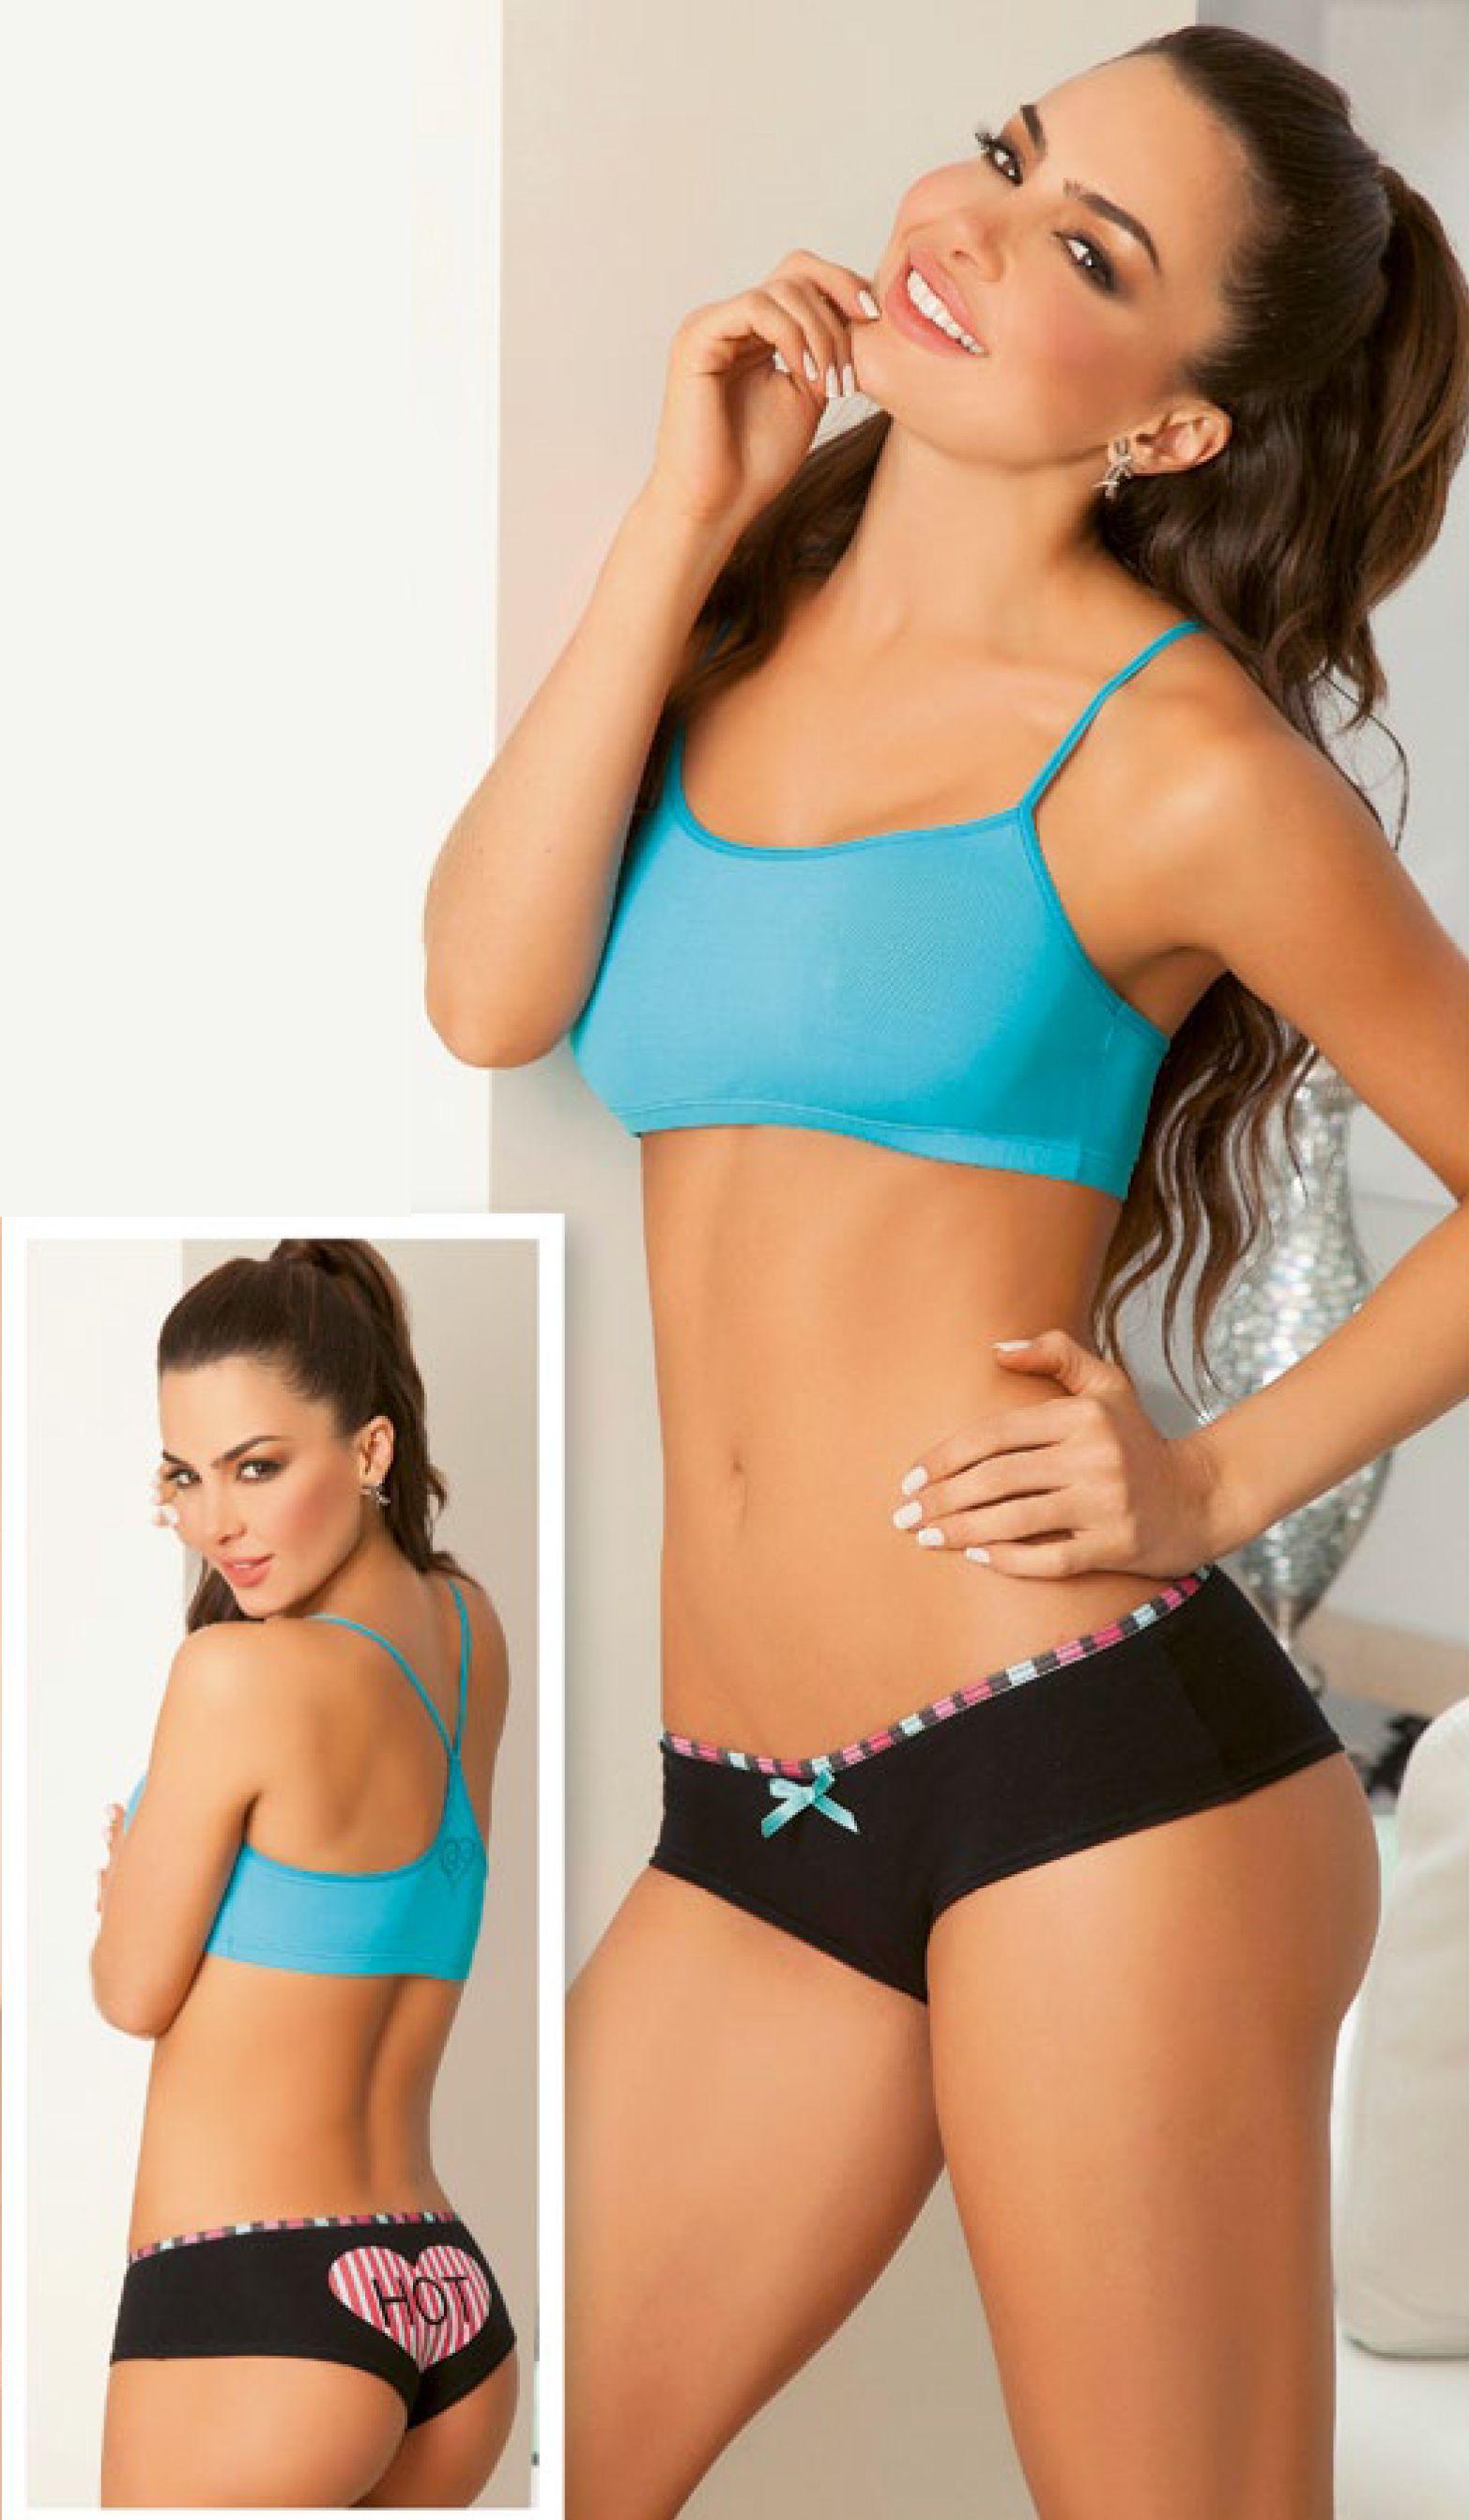 Lencer a ropa interior femenina for Foto ropa interior femenina